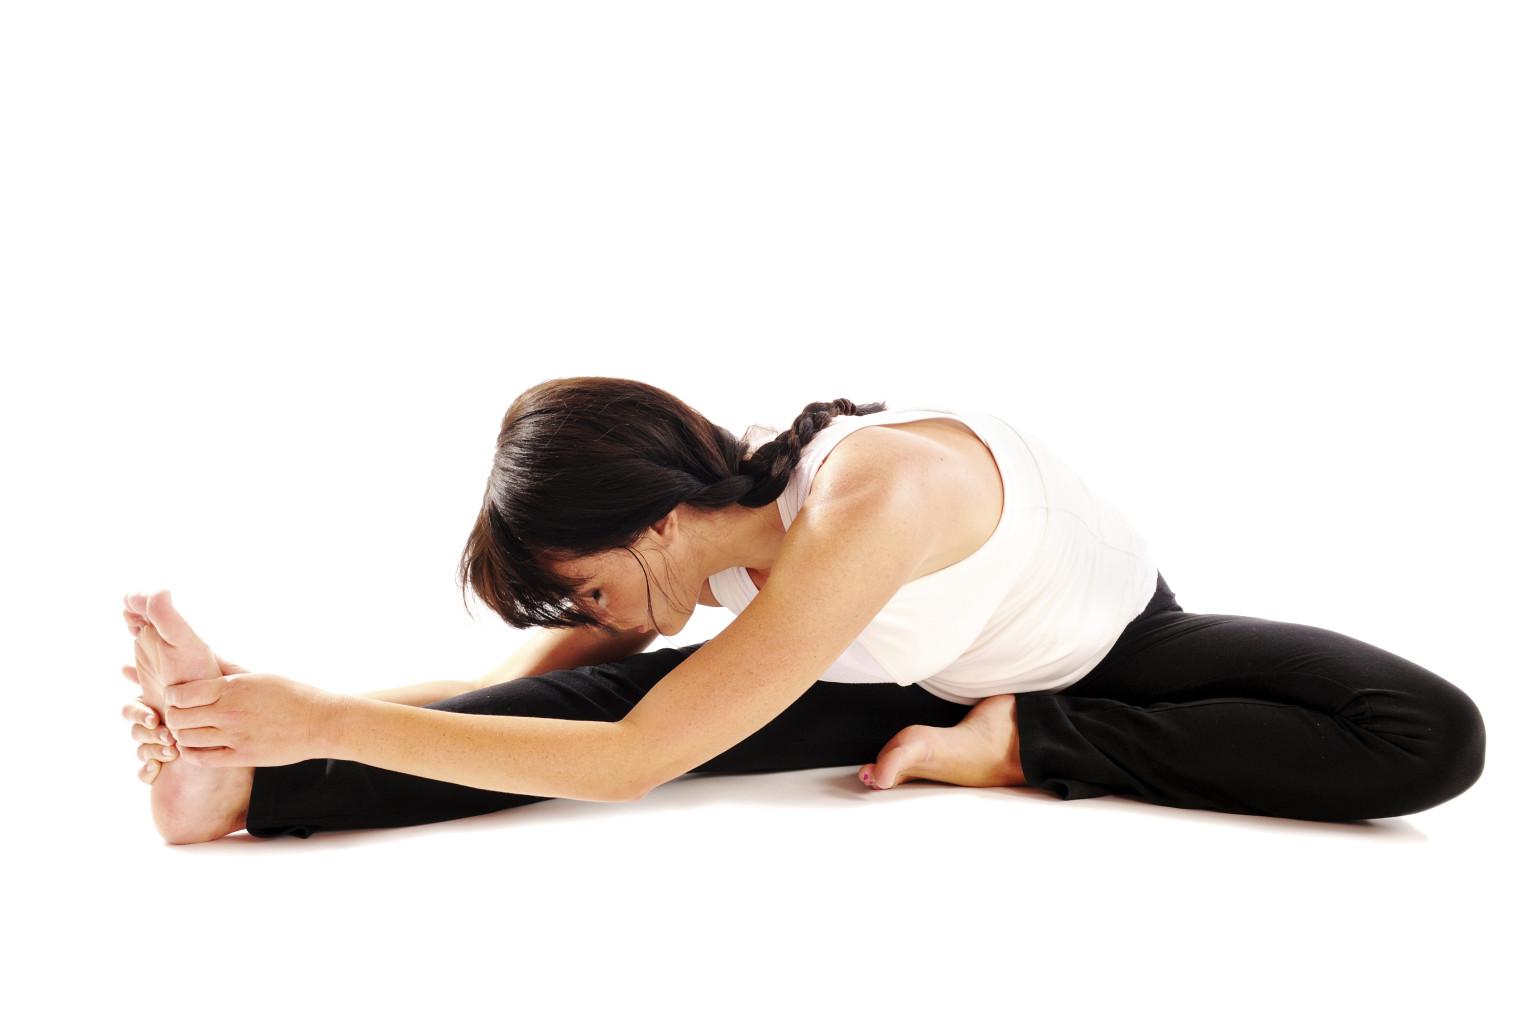 Yoga Pilates Single Leg Stretch